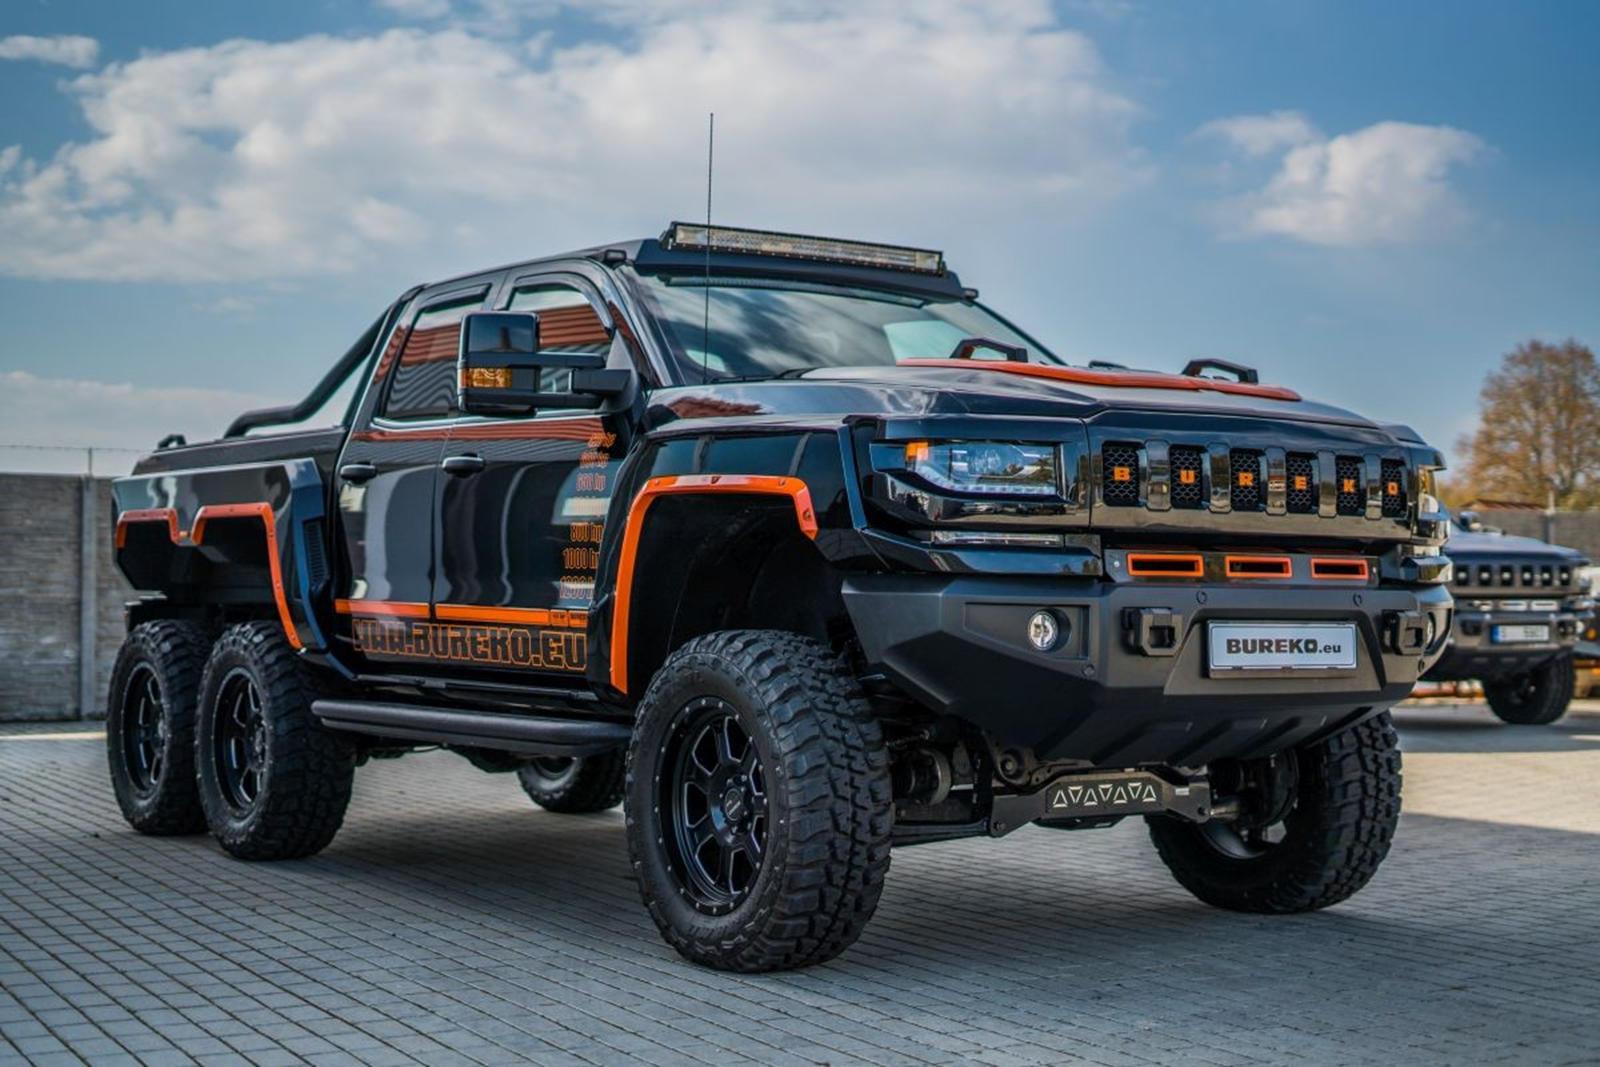 Meet The Bureko A Chevy Silverado 6x6 With 1 200 Hp Carbuzz